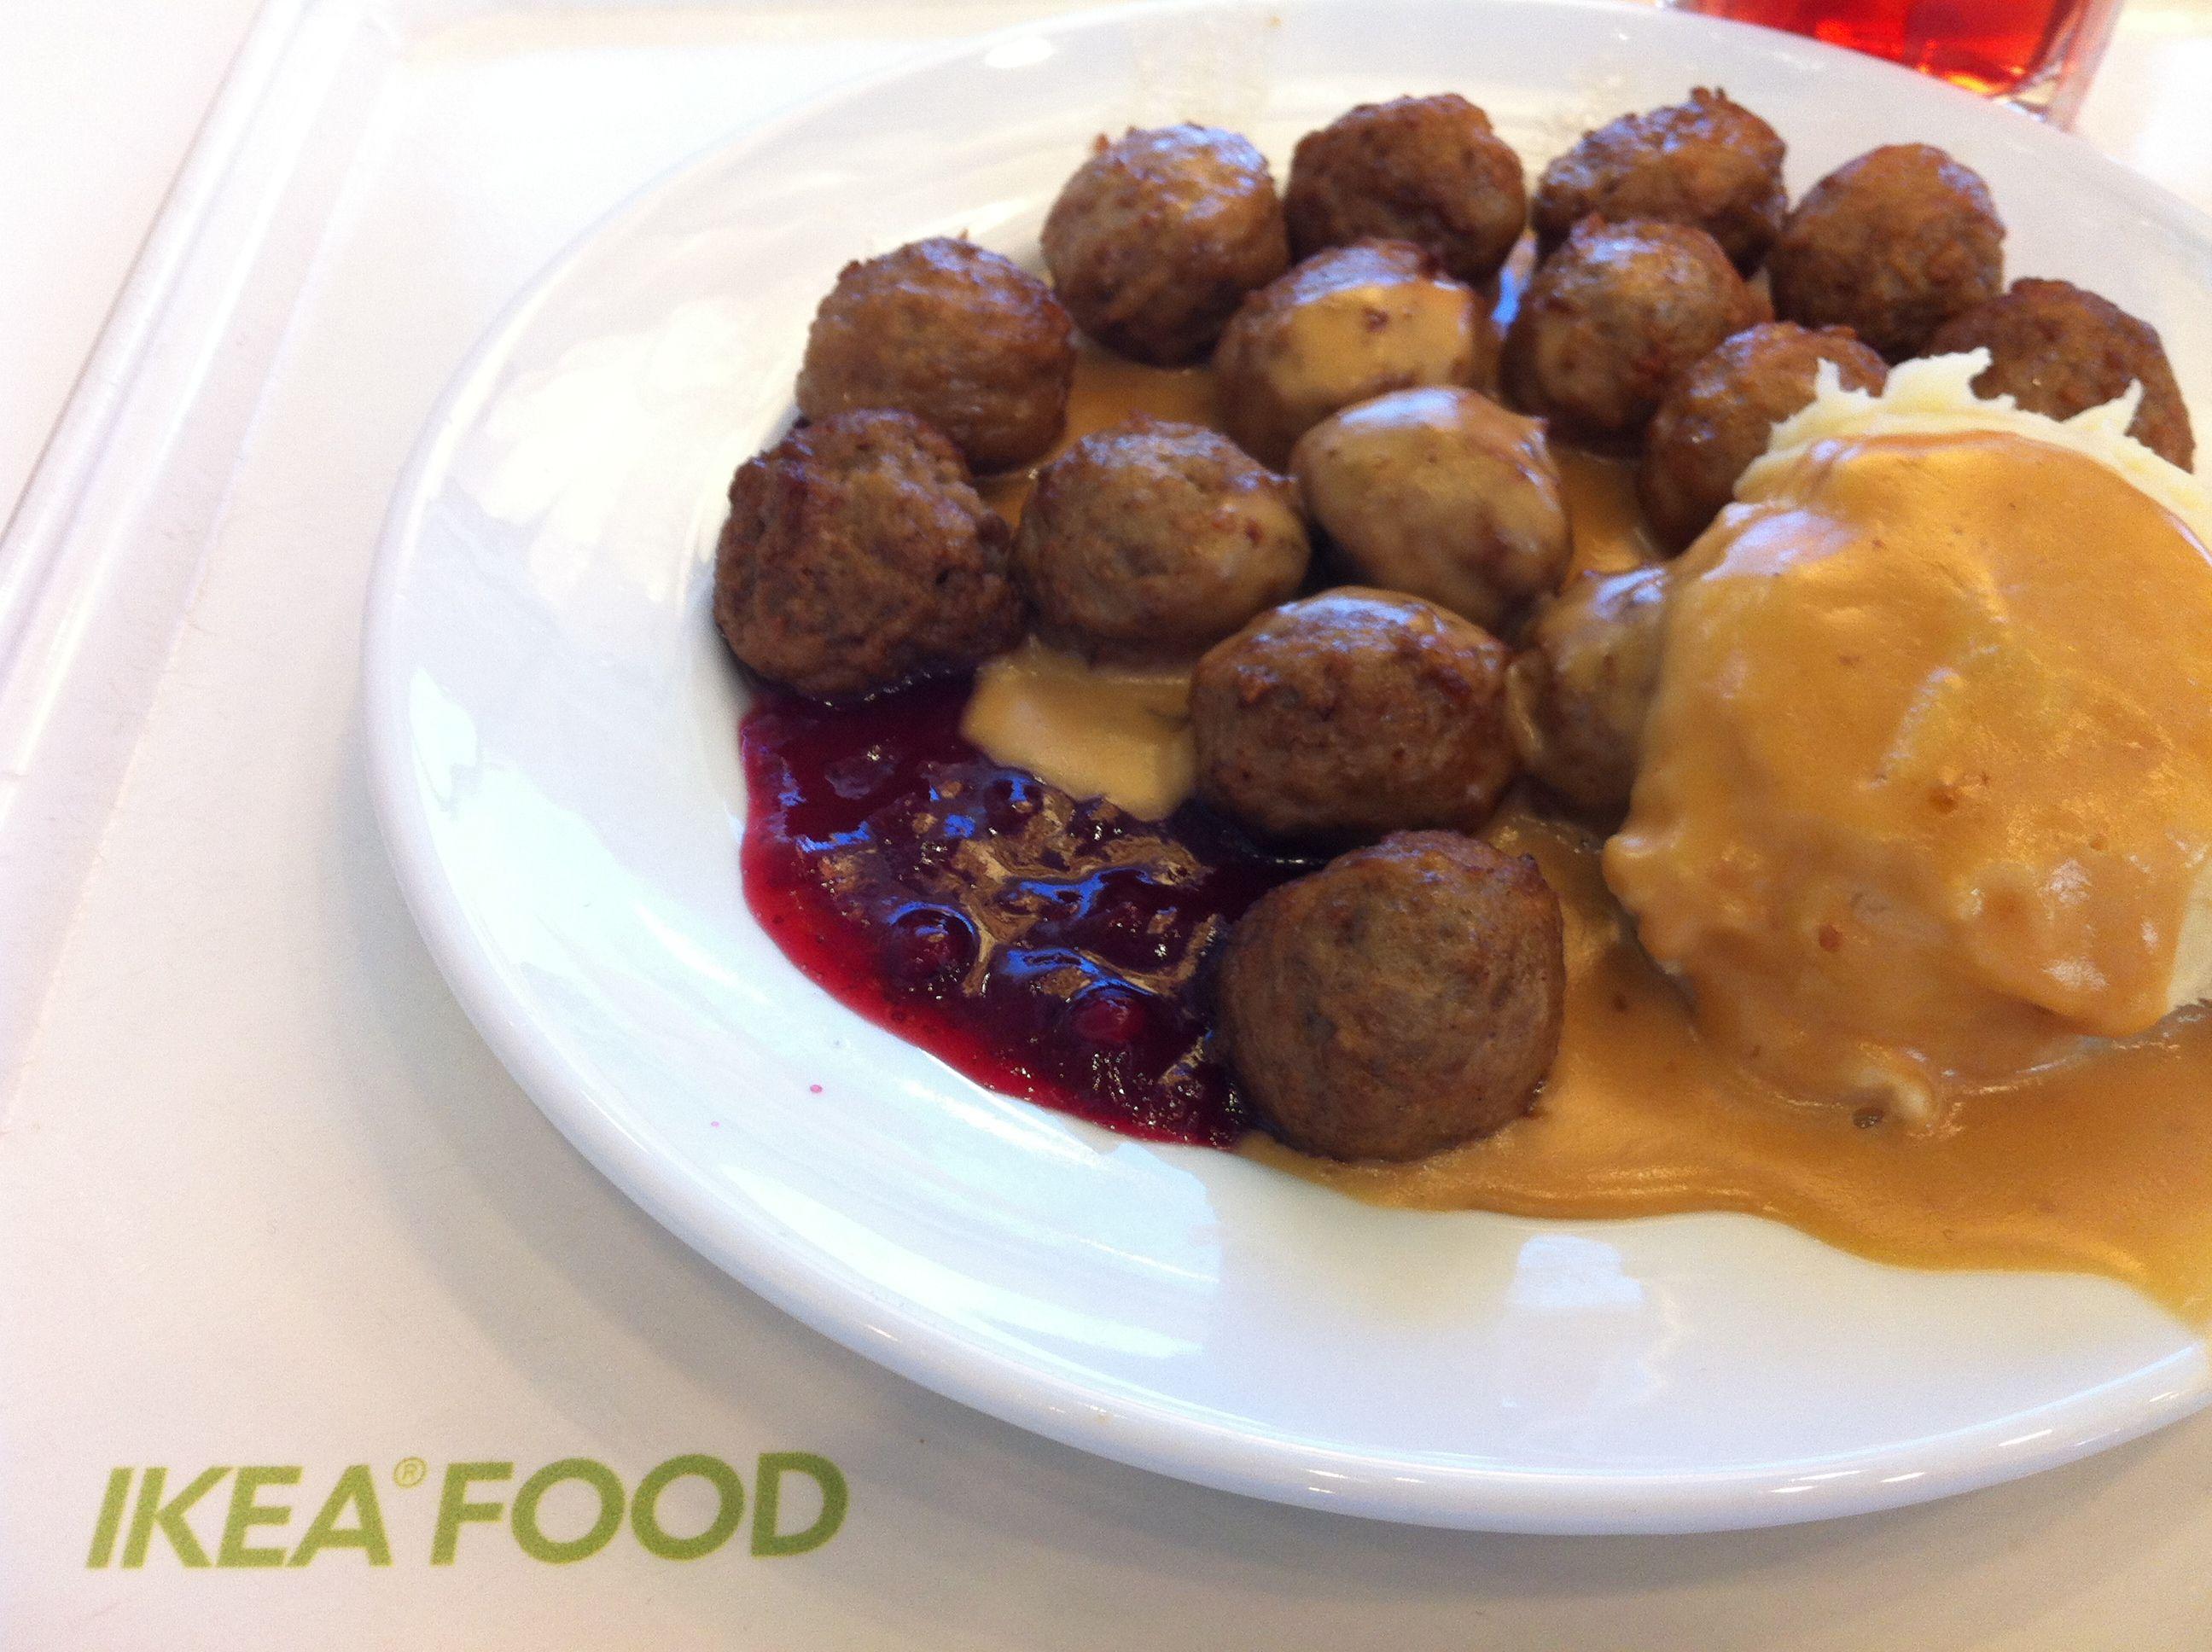 Ikea's Swedish Meatballs   Food   Pinterest